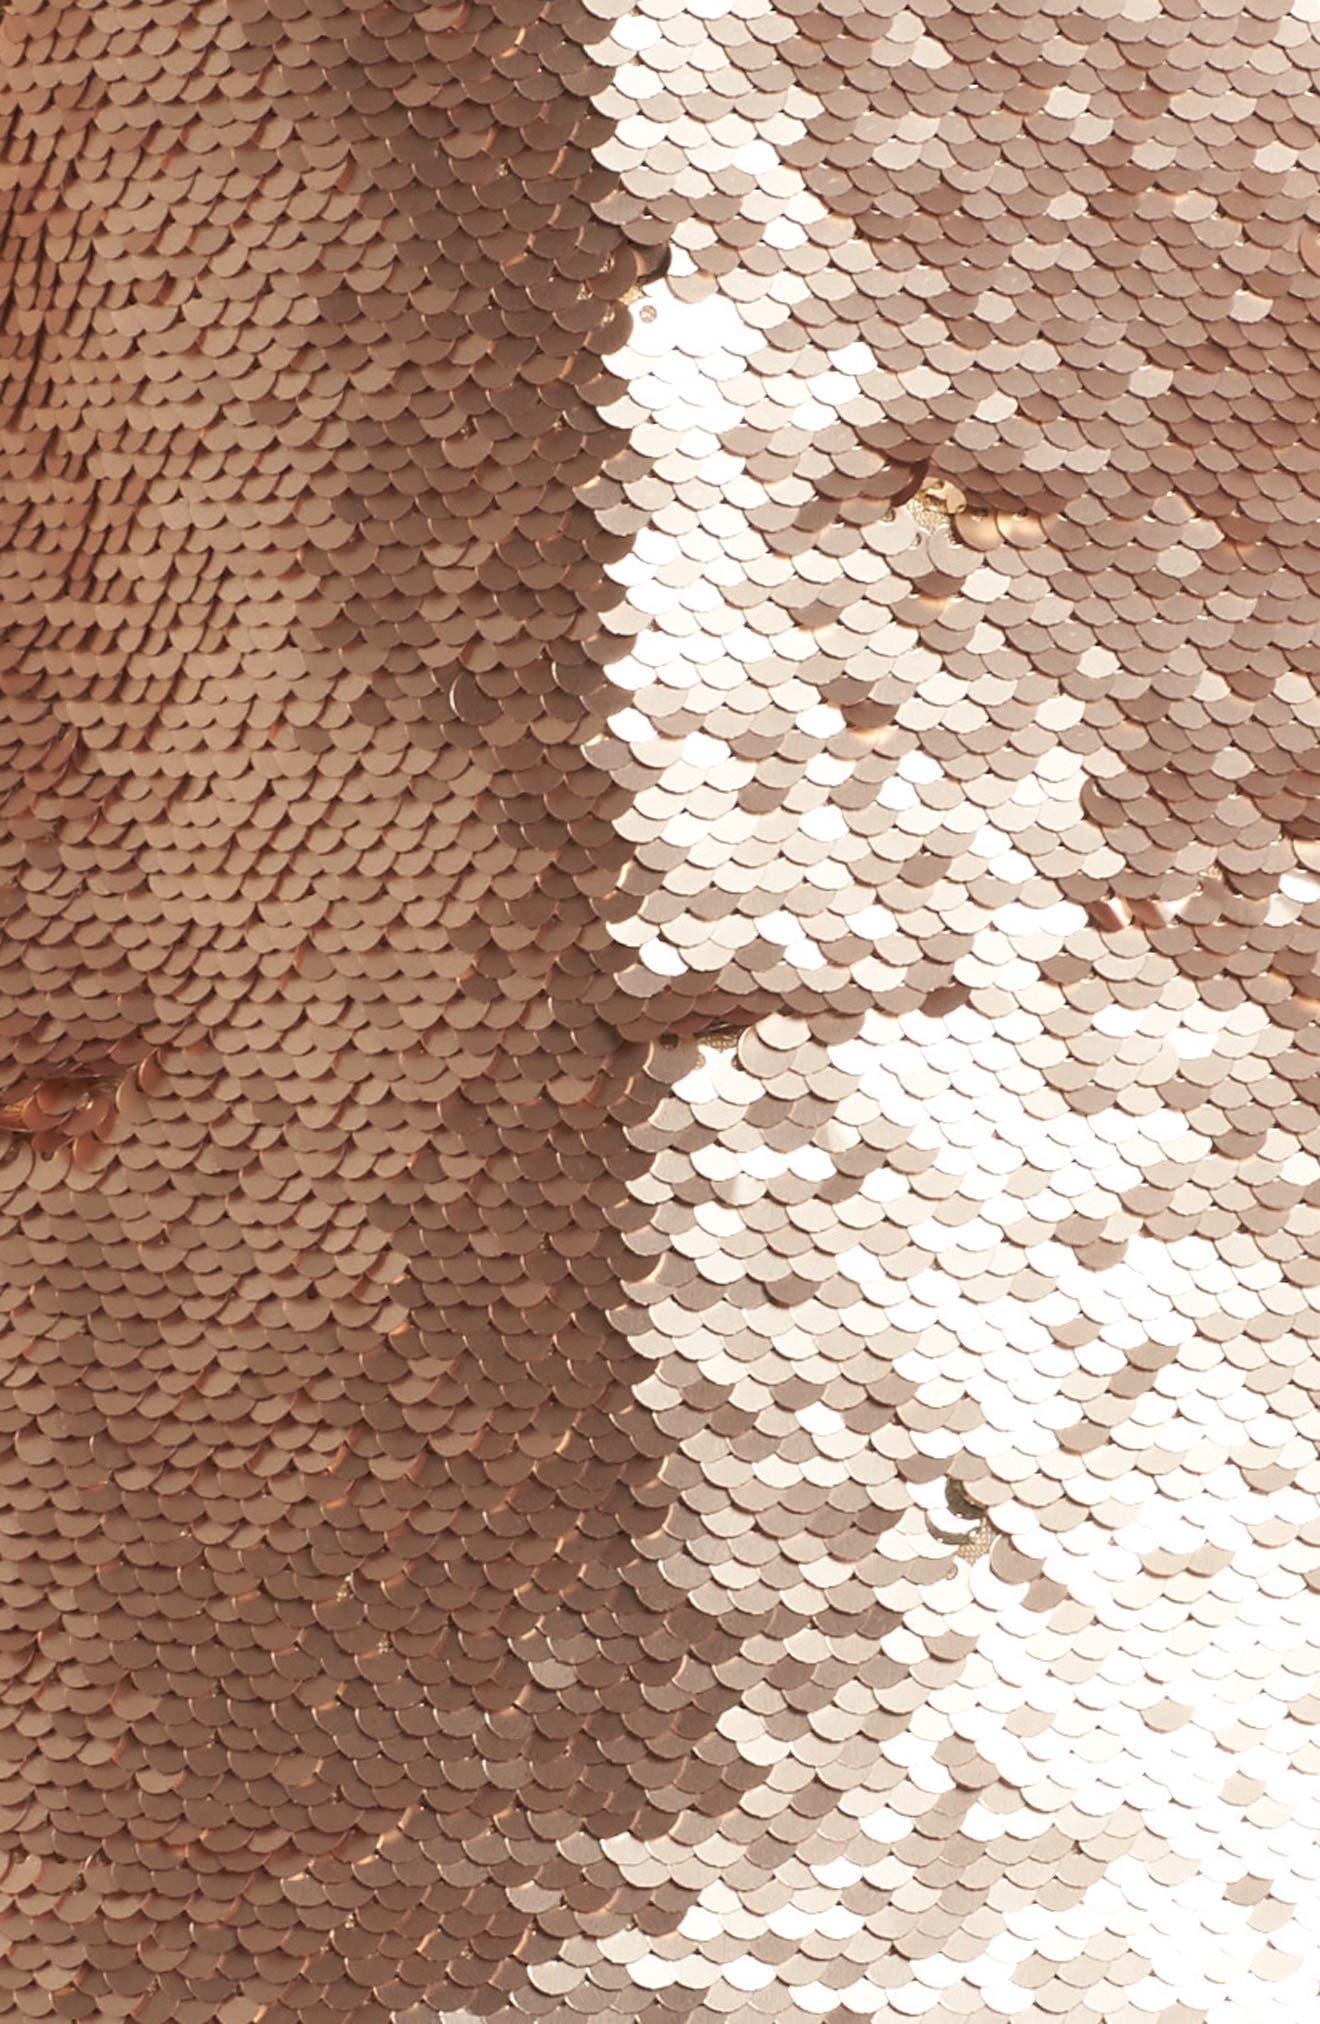 Revolution Off the Shoulder Sequin Top,                             Alternate thumbnail 5, color,                             Champagne Blush